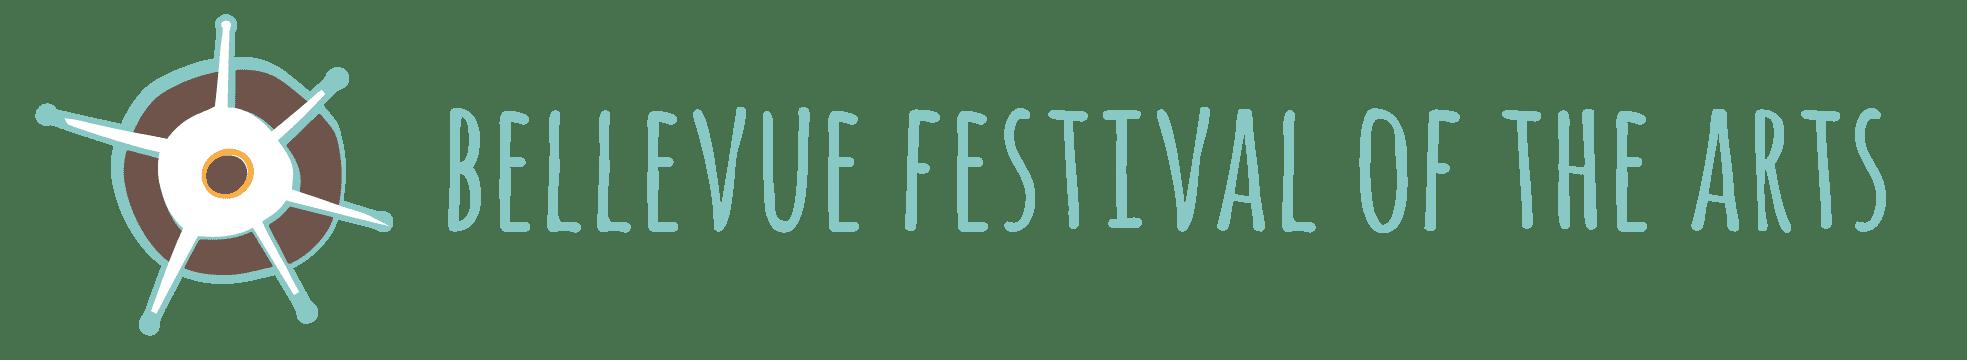 Belleuve Festival of the Arts Banner